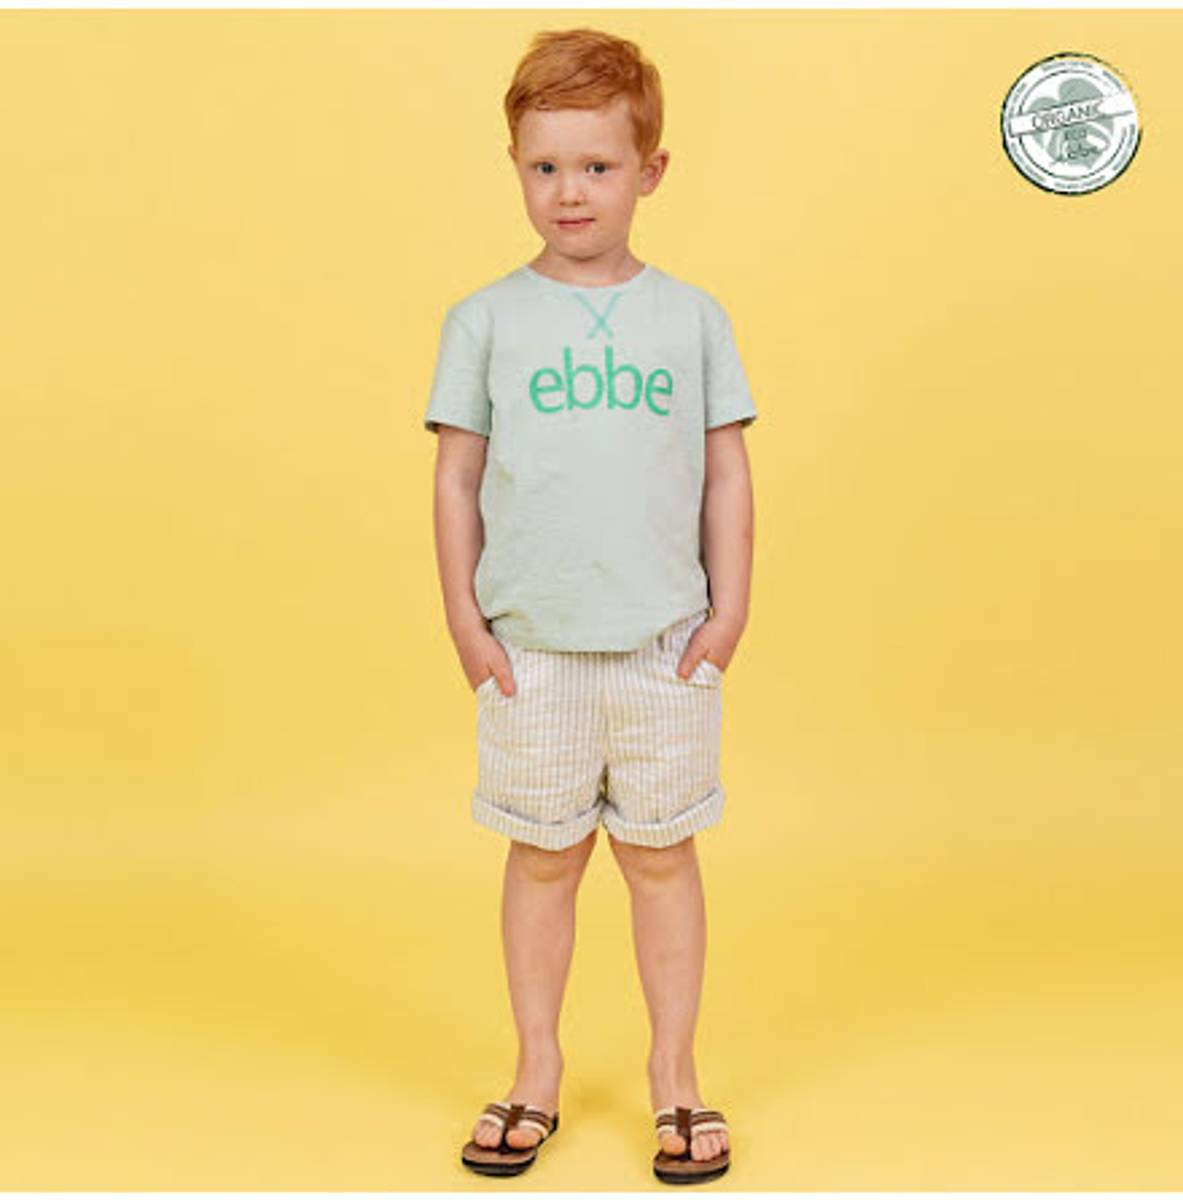 EBBE - SHORTS CHINOS